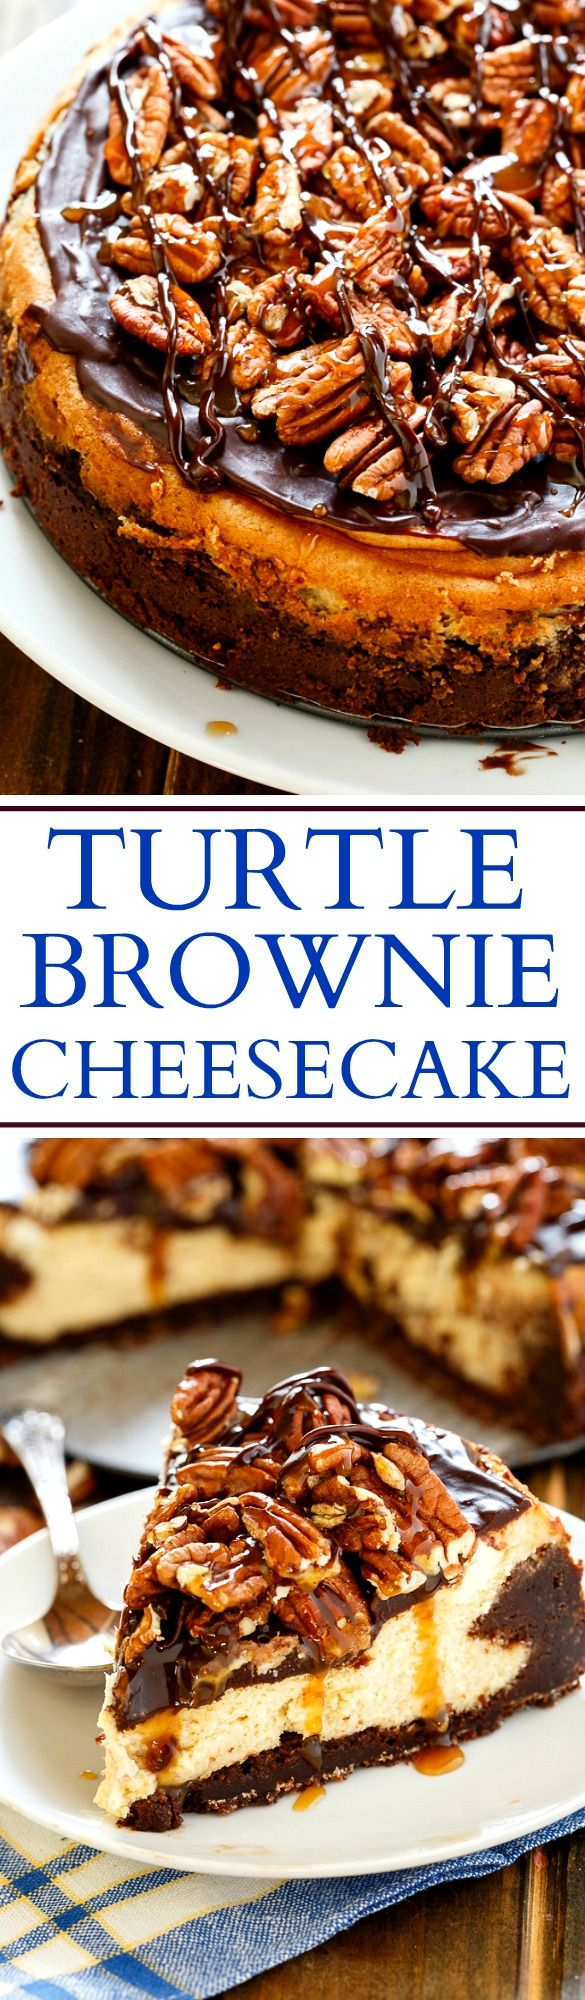 Turtle Brownie Cheesecake